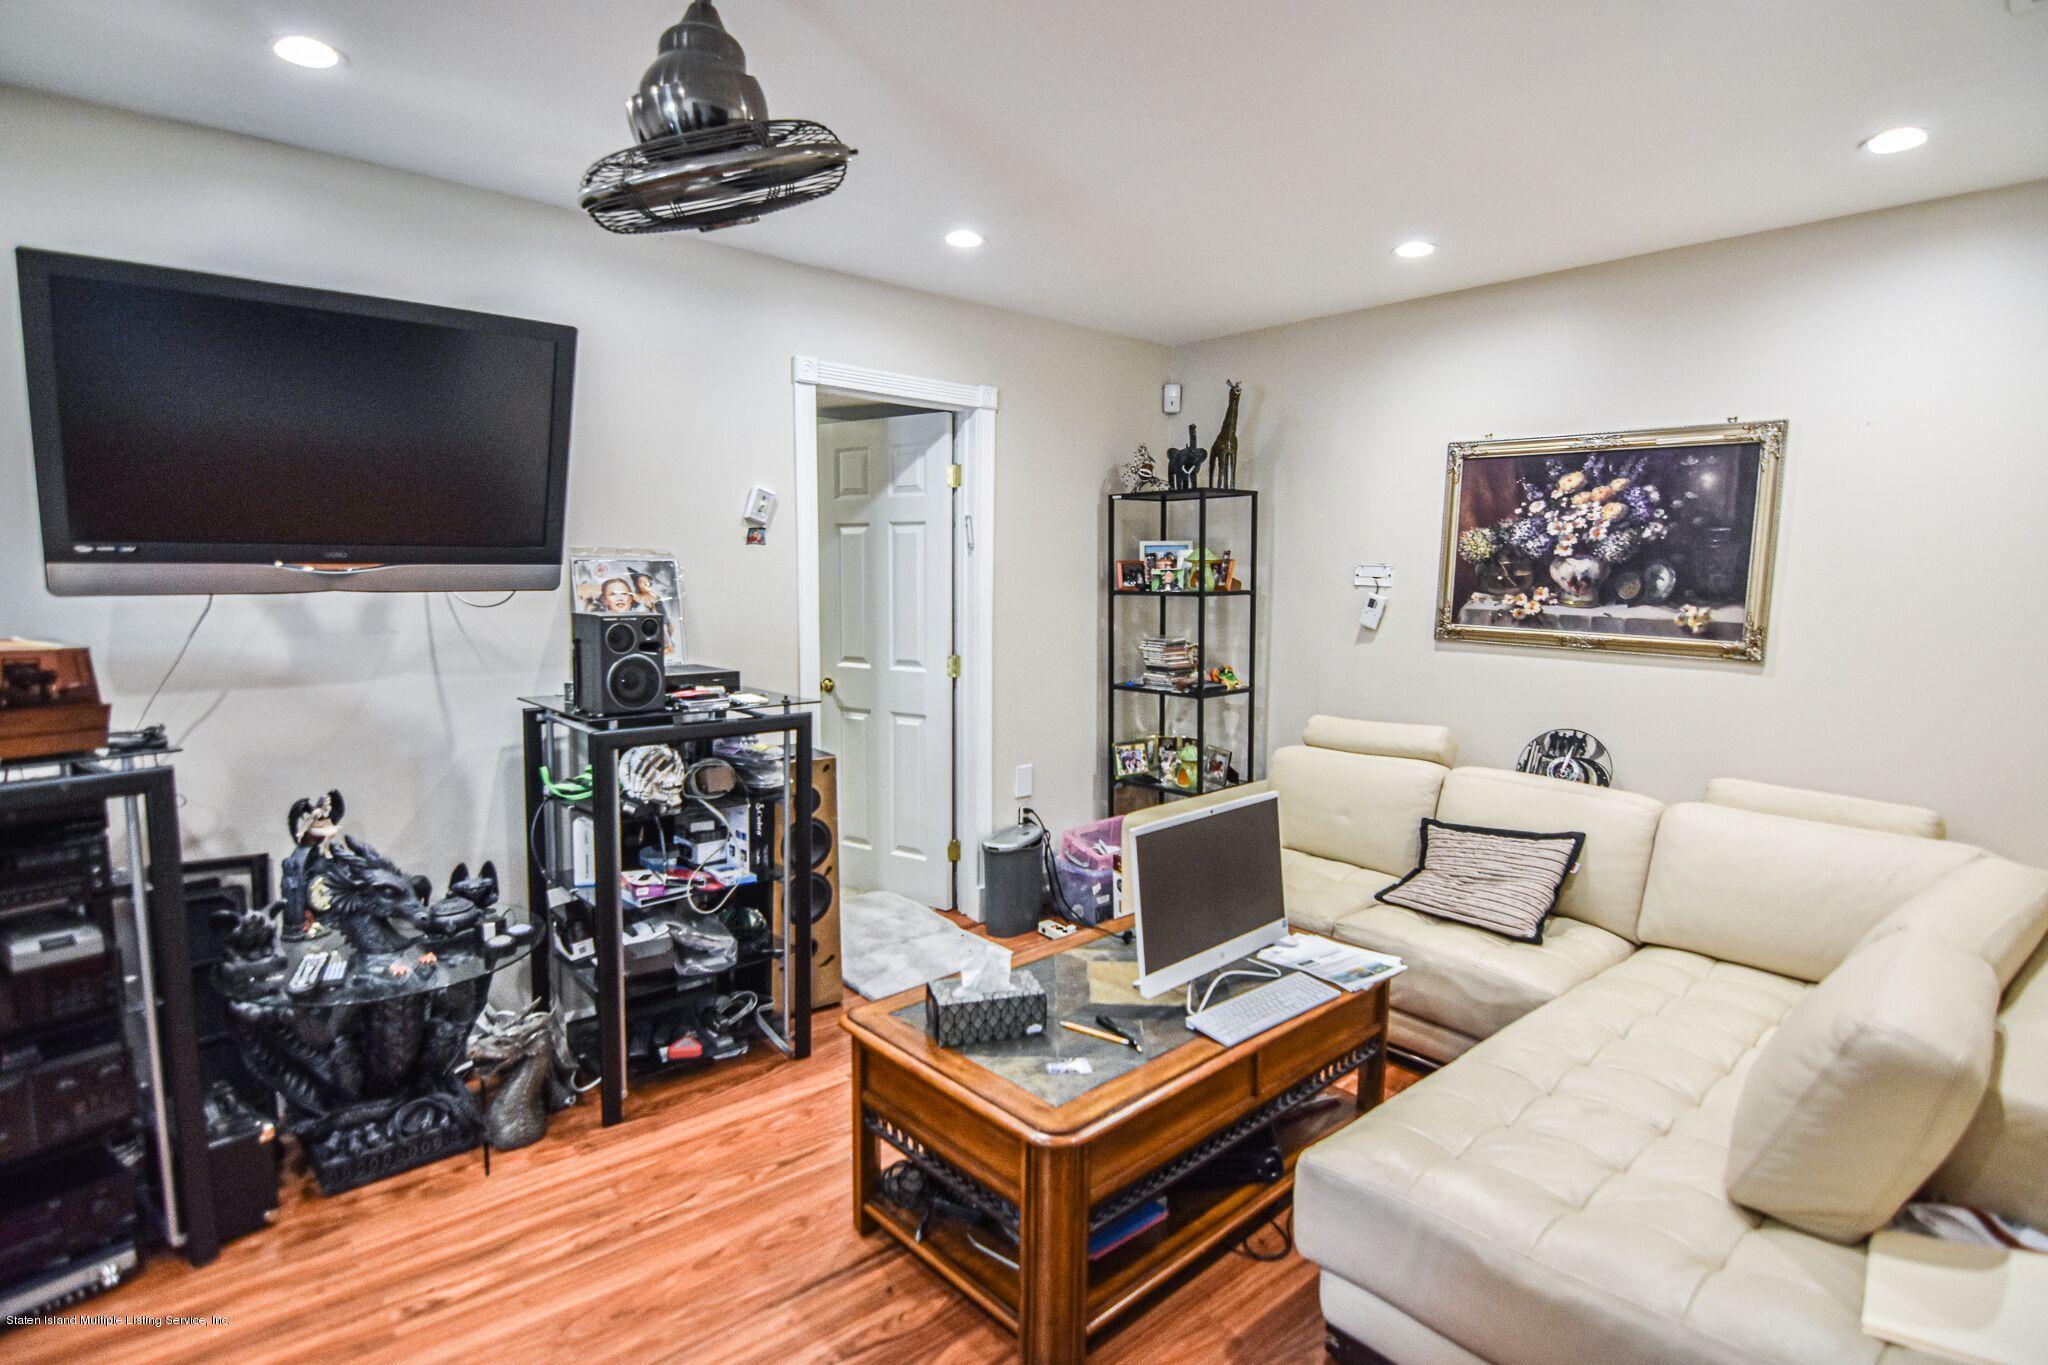 Two Family - Detached 3 Fieldstone Road  Staten Island, NY 10314, MLS-1131141-7